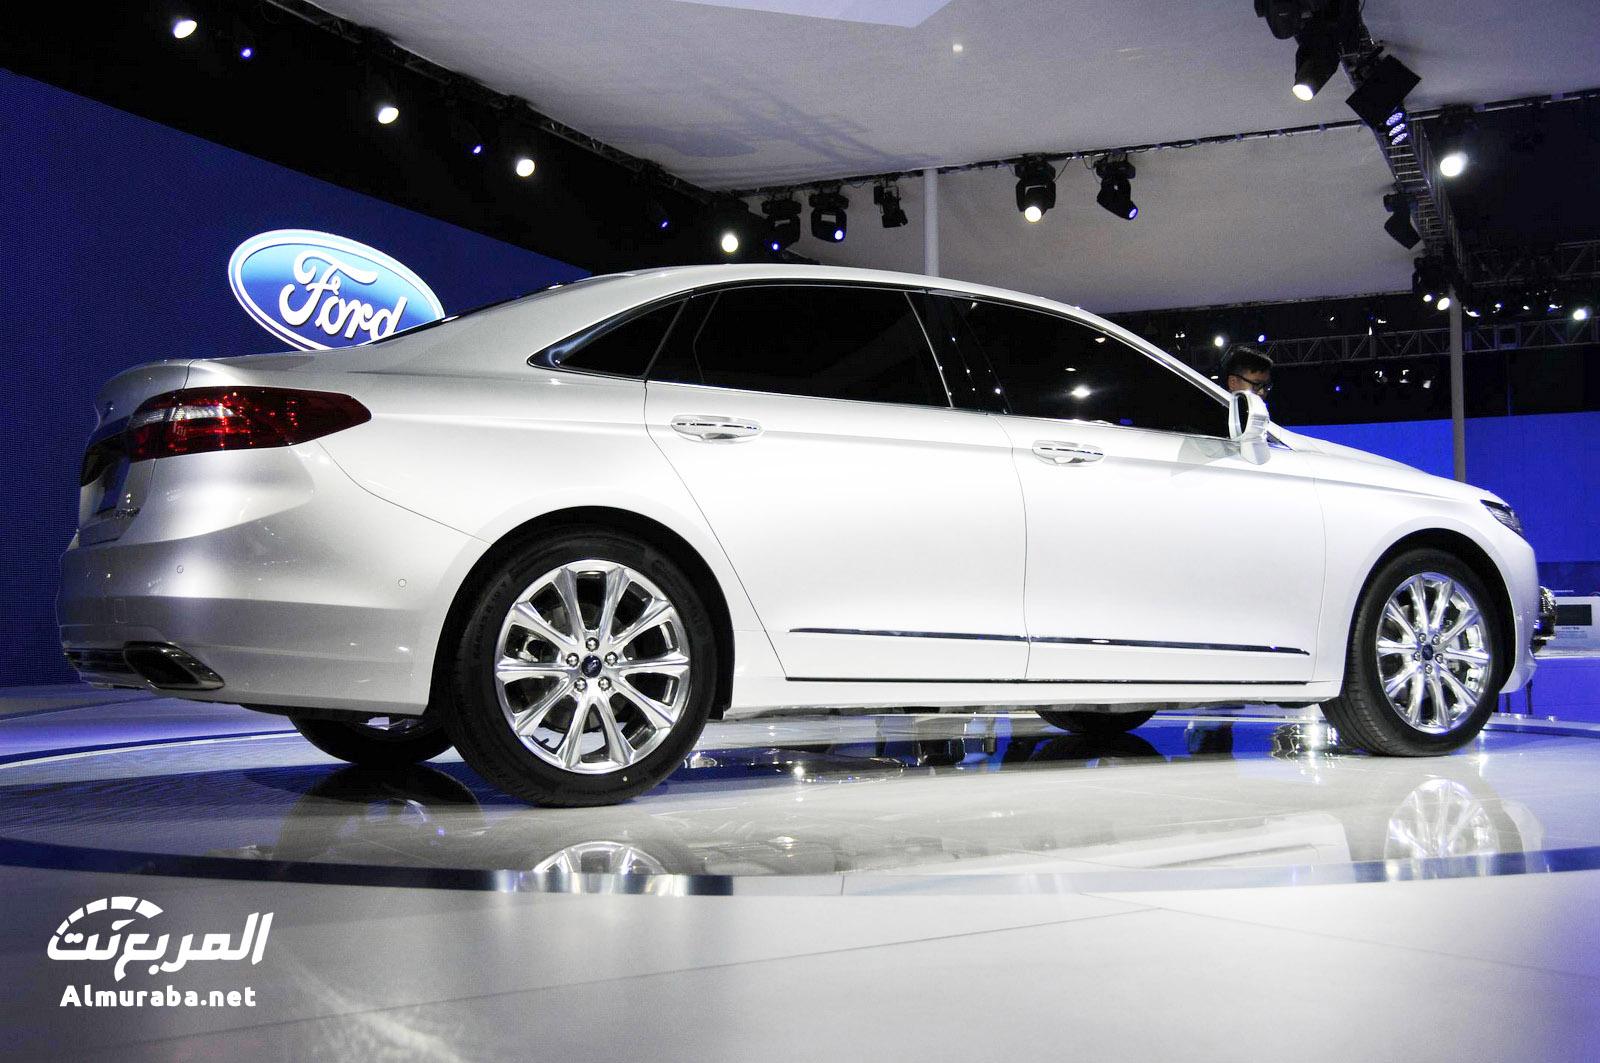 "2016 Ford Taurus Sho >> فورد تورس 2016 بالتطويرات الجديدة ""تقرير ومواصفات وصور وفيديو"" Ford Taurus – المربع نت"